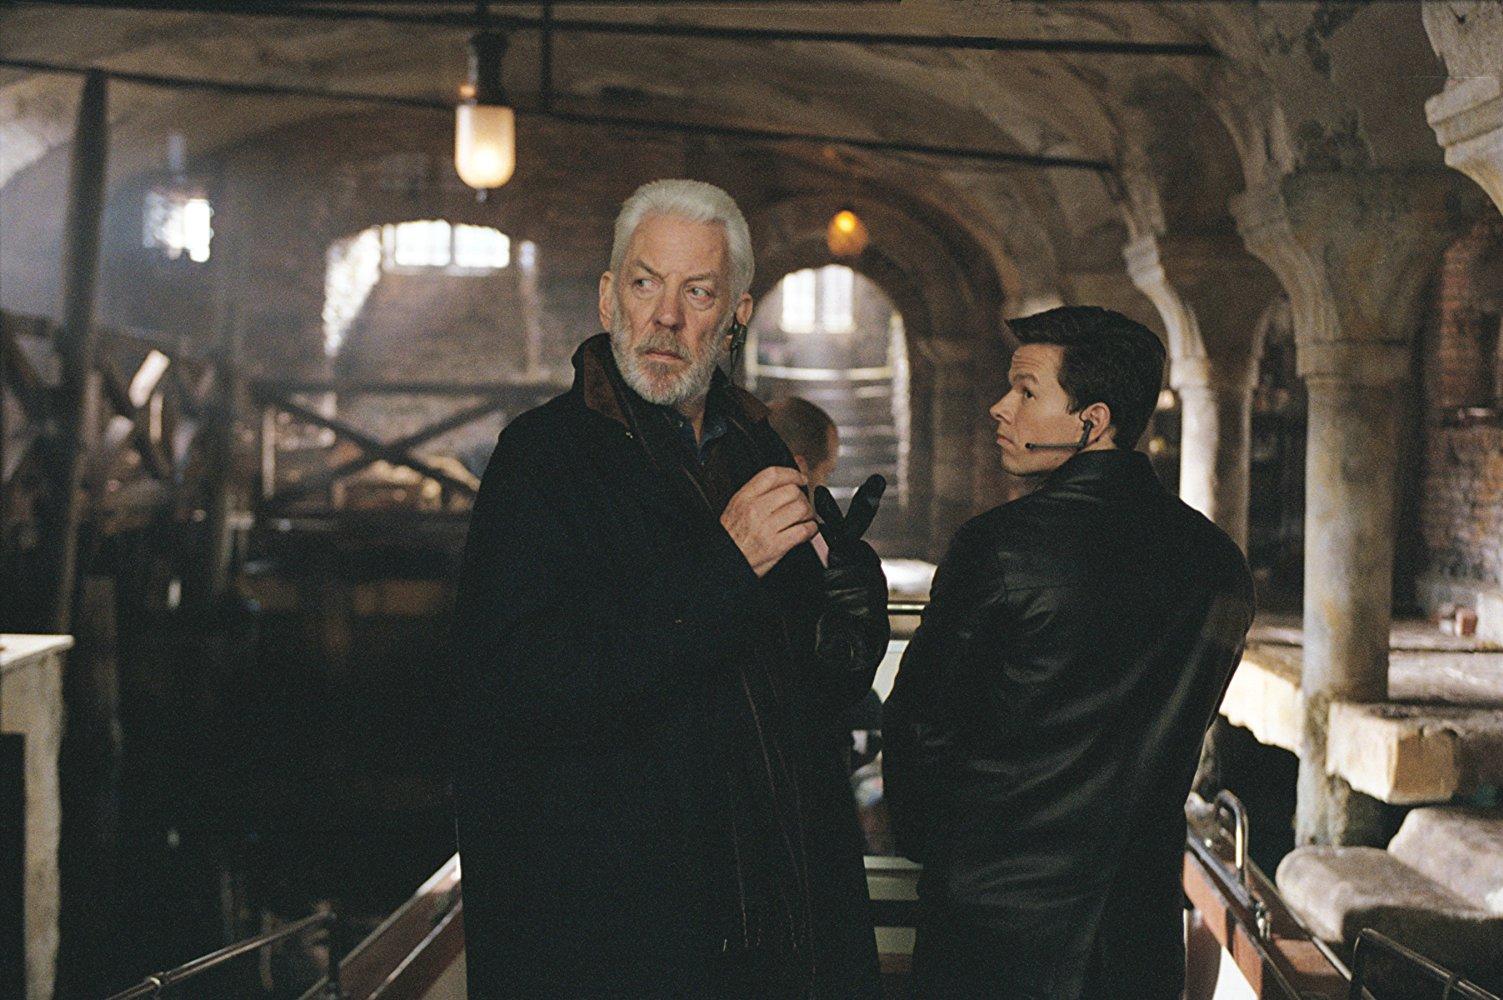 Braquage à l'italienne - Film (2003) - EcranLarge.com